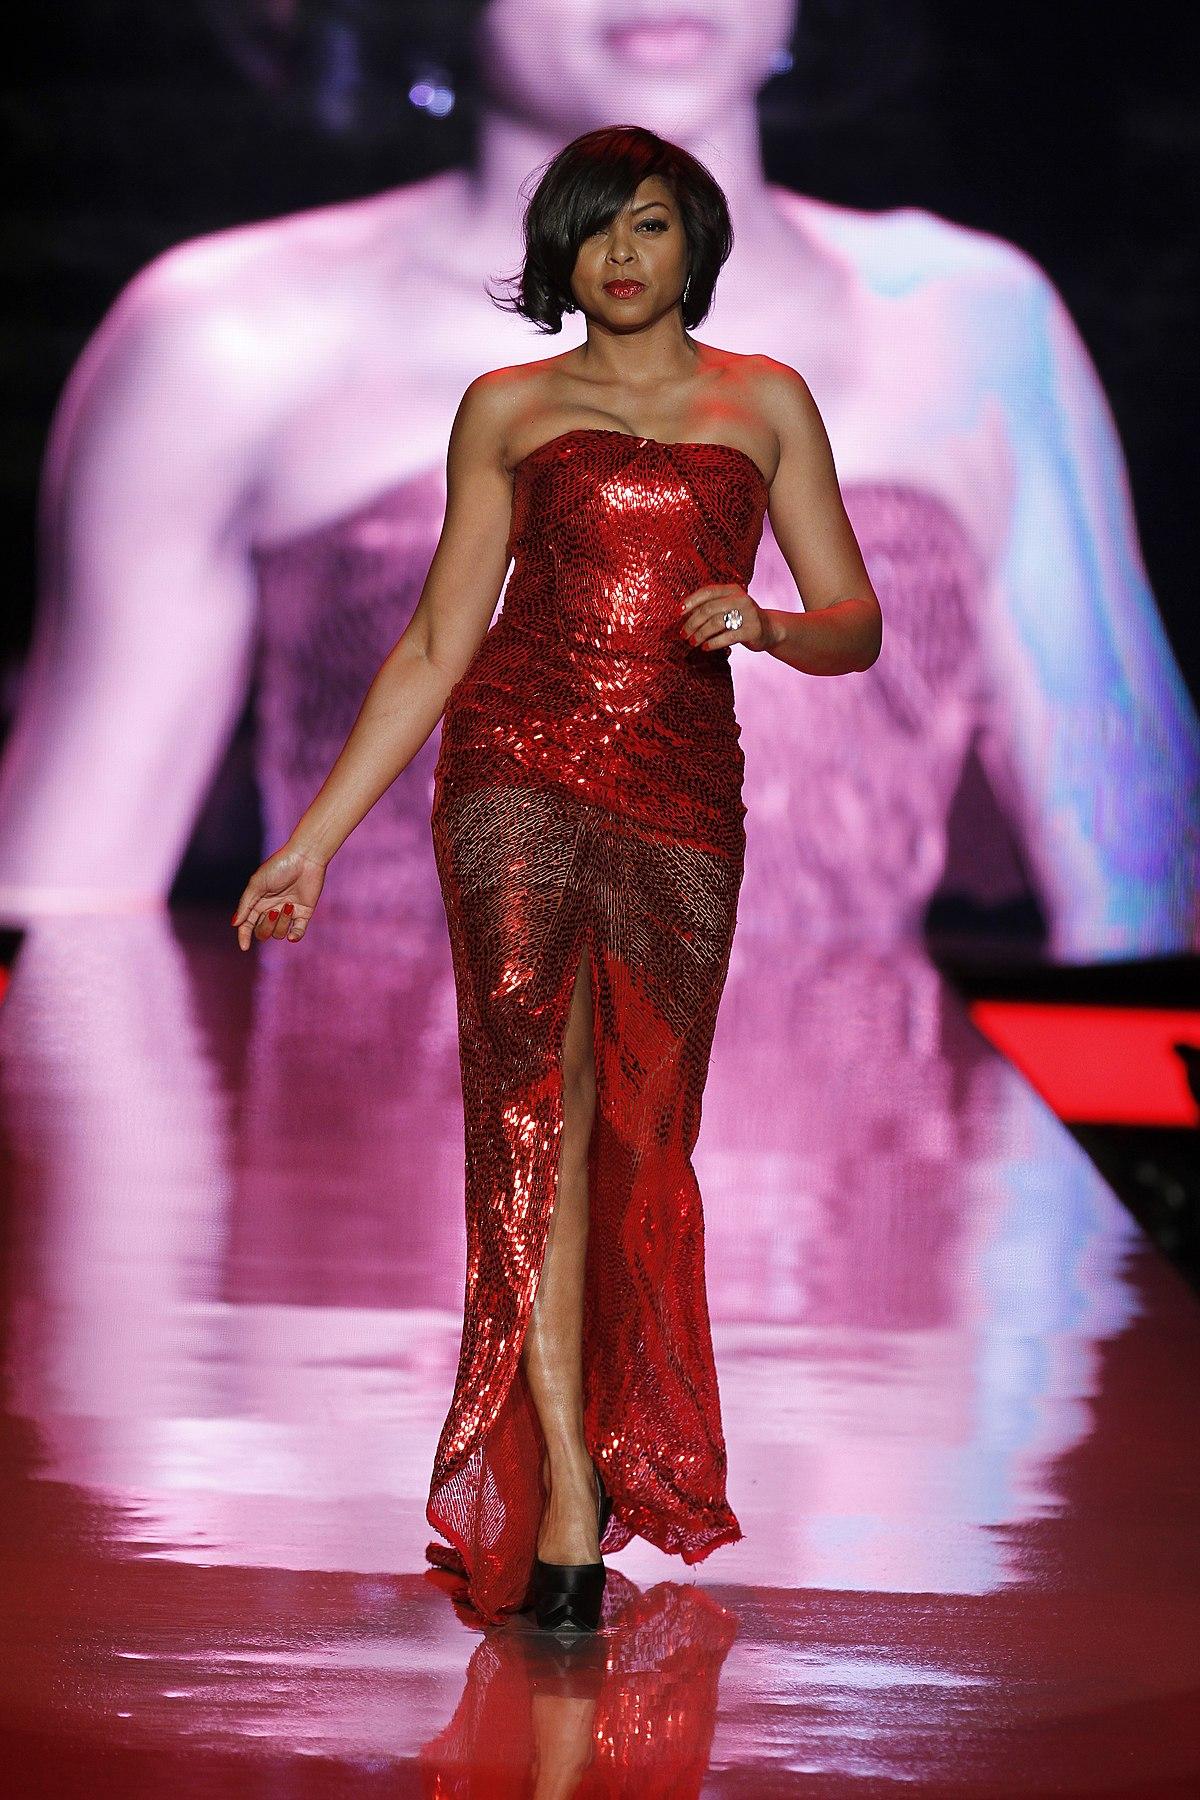 Fitxer:Young Woman in Red Dress.jpg - Viquipèdia, l